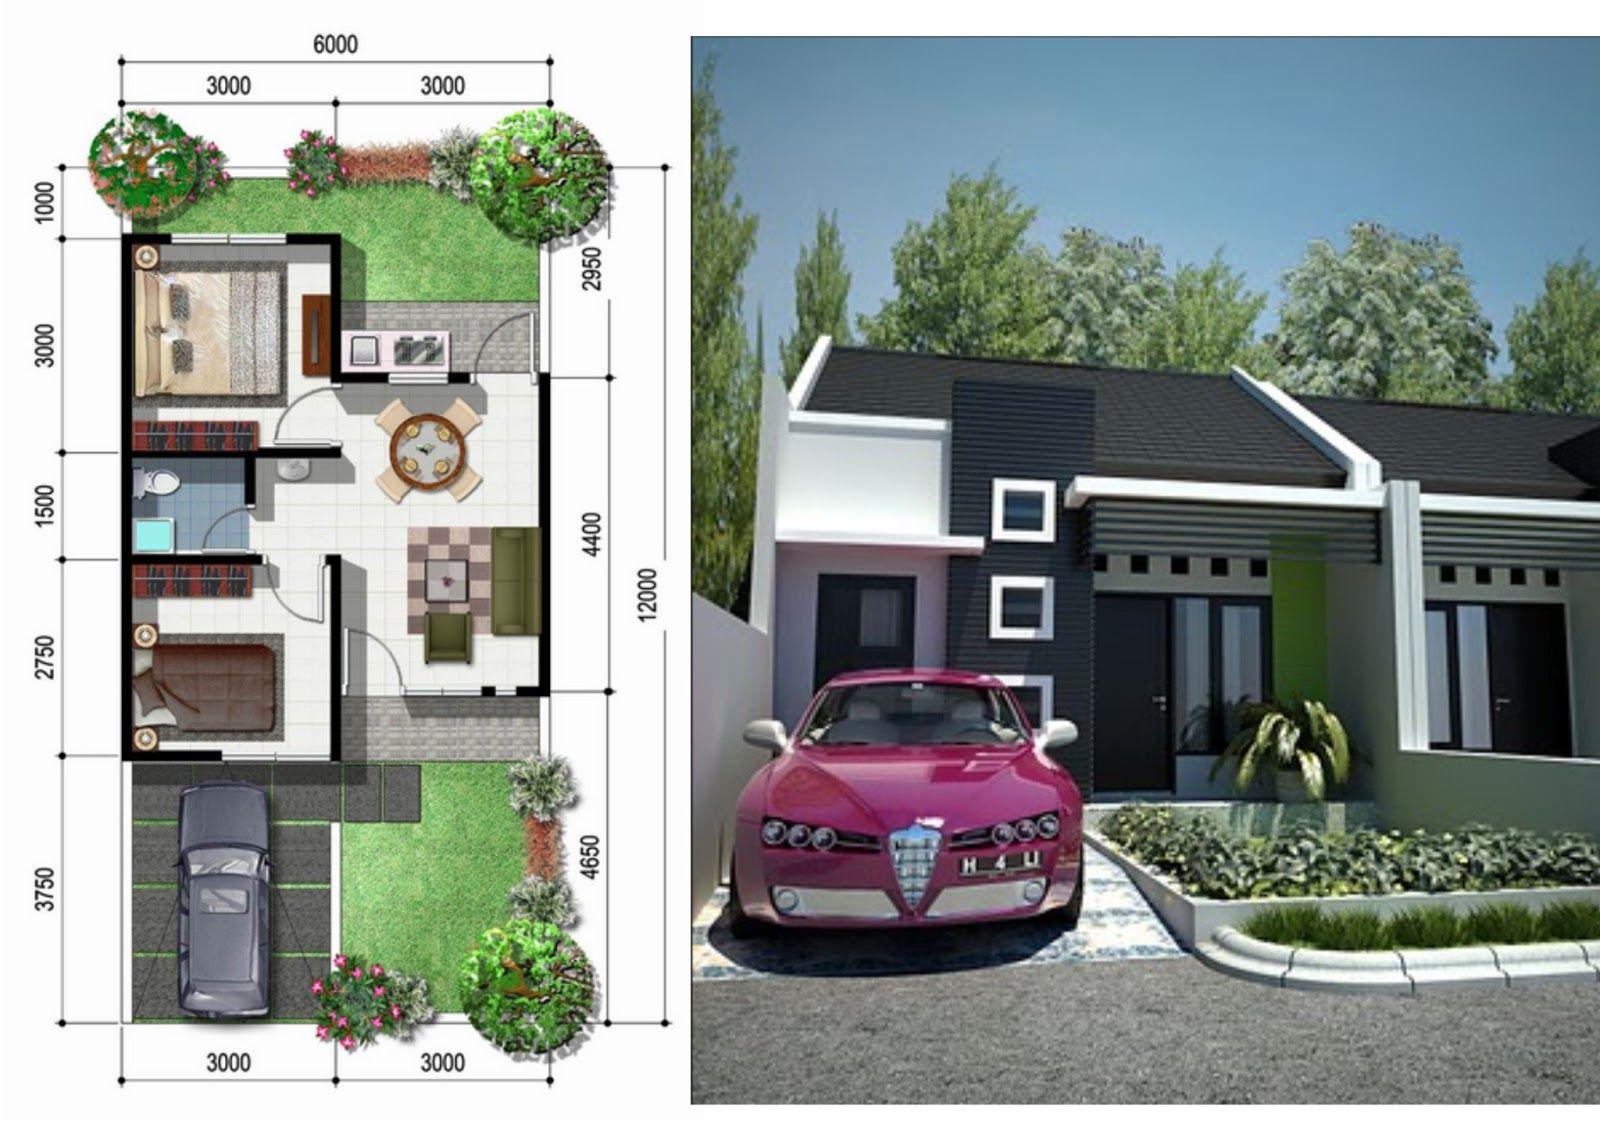 Desain Rumah Minimalis Type 36 Rumah Minimalis Type 36 Pinterest